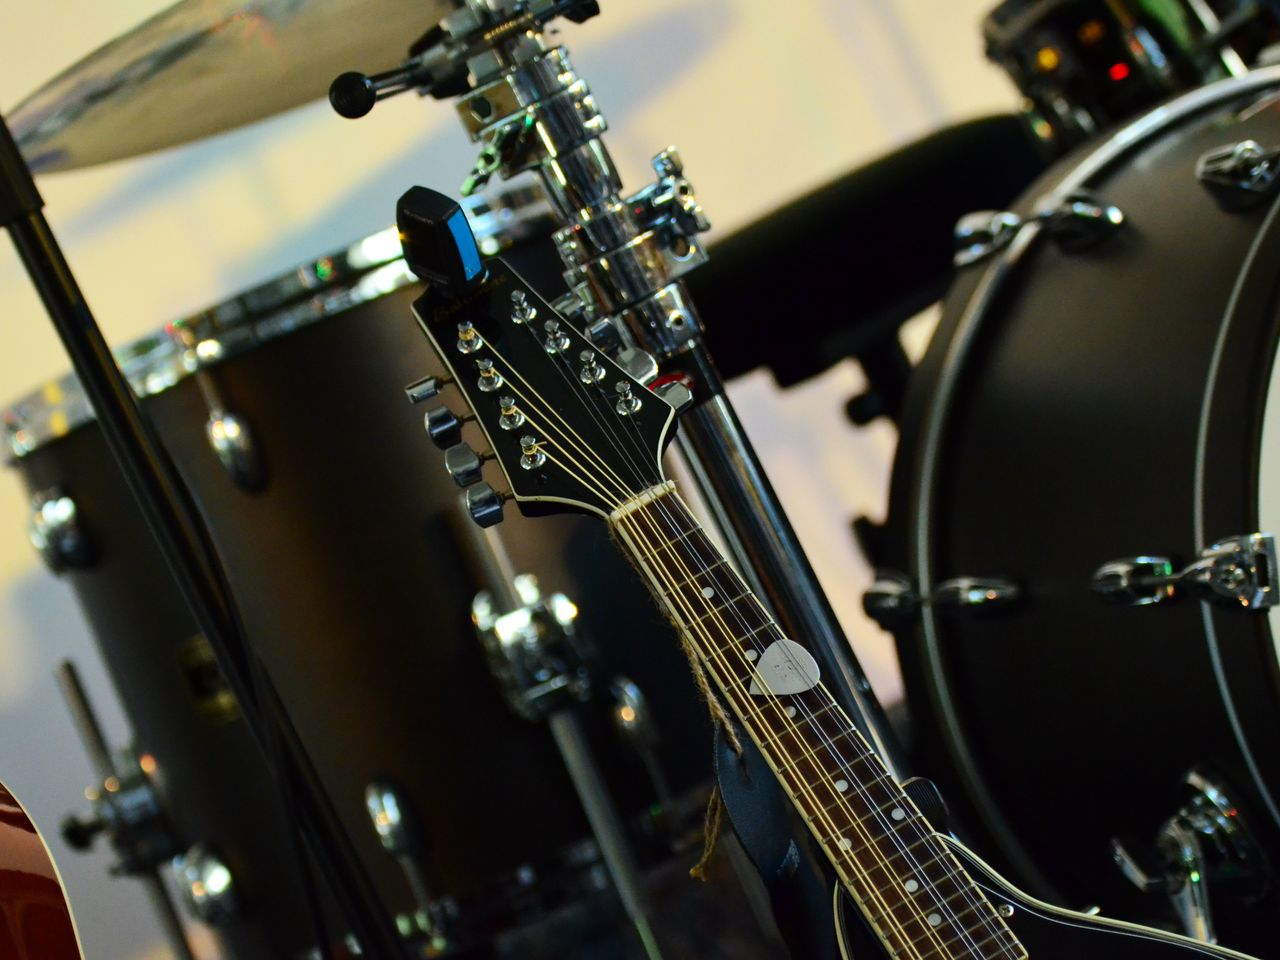 1280x960 Wallpaper musical instrument, music, percussion, guitar